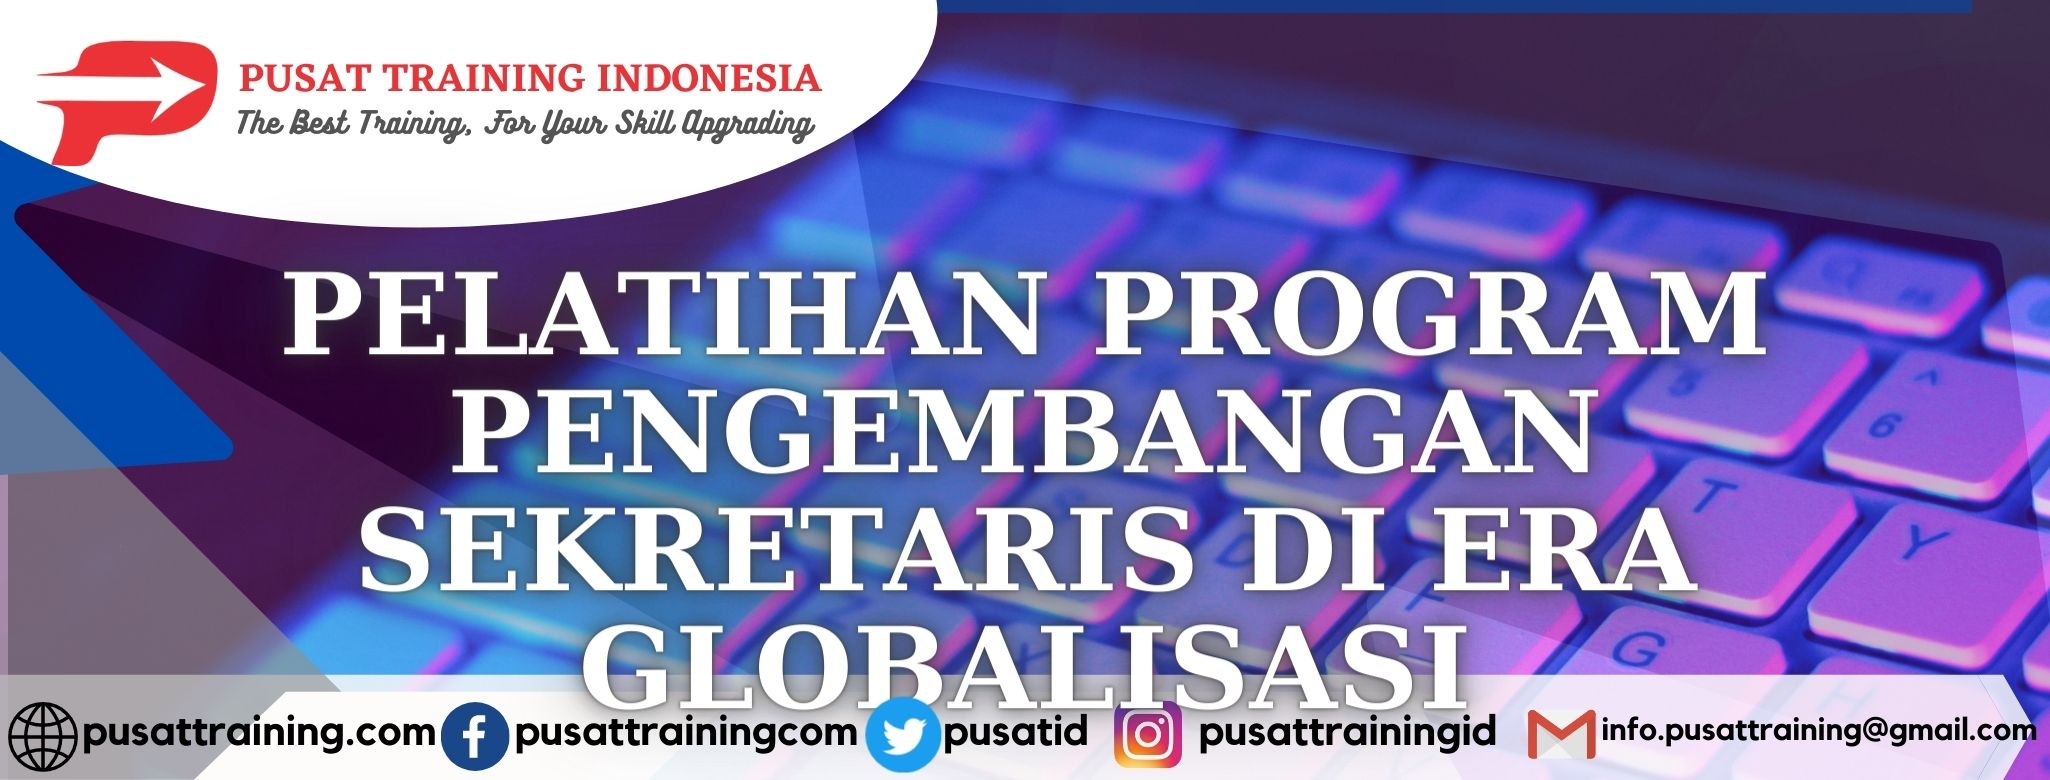 pelatihan-program-pengembangan-sekretaris-di -era-globalisas